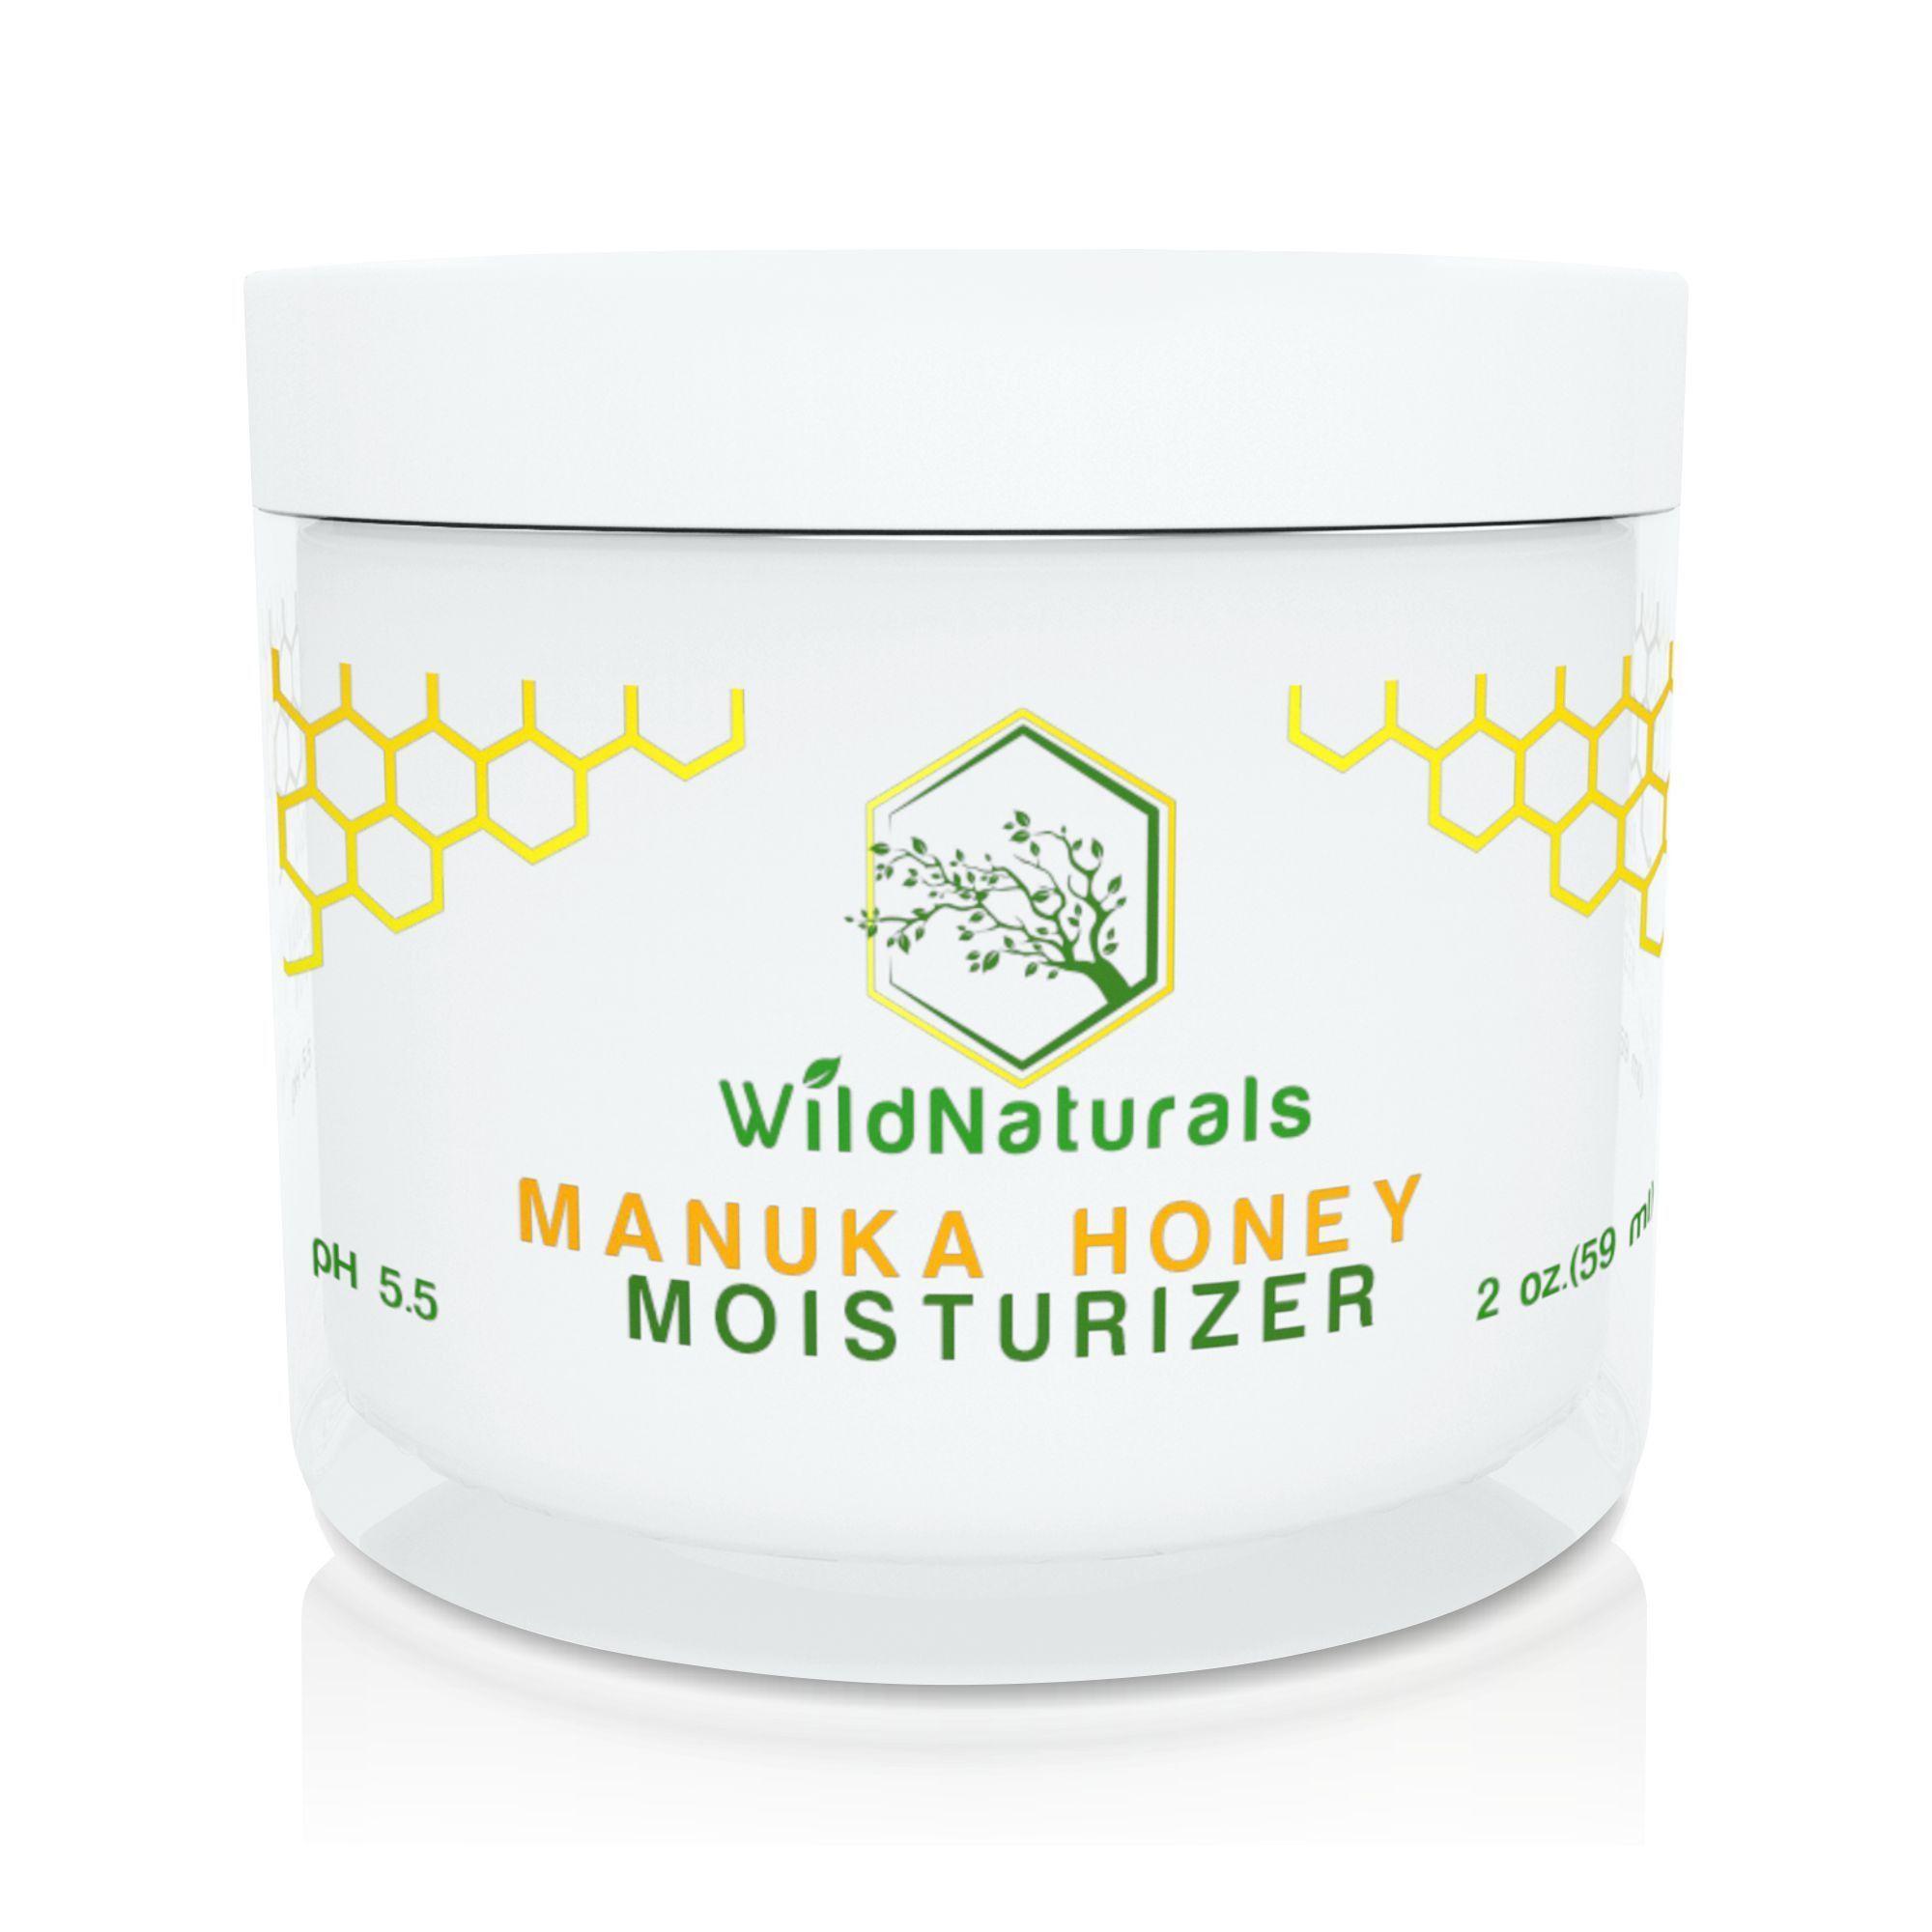 Manuka Honey Face Cream Moisturizer Face cream, Manuka